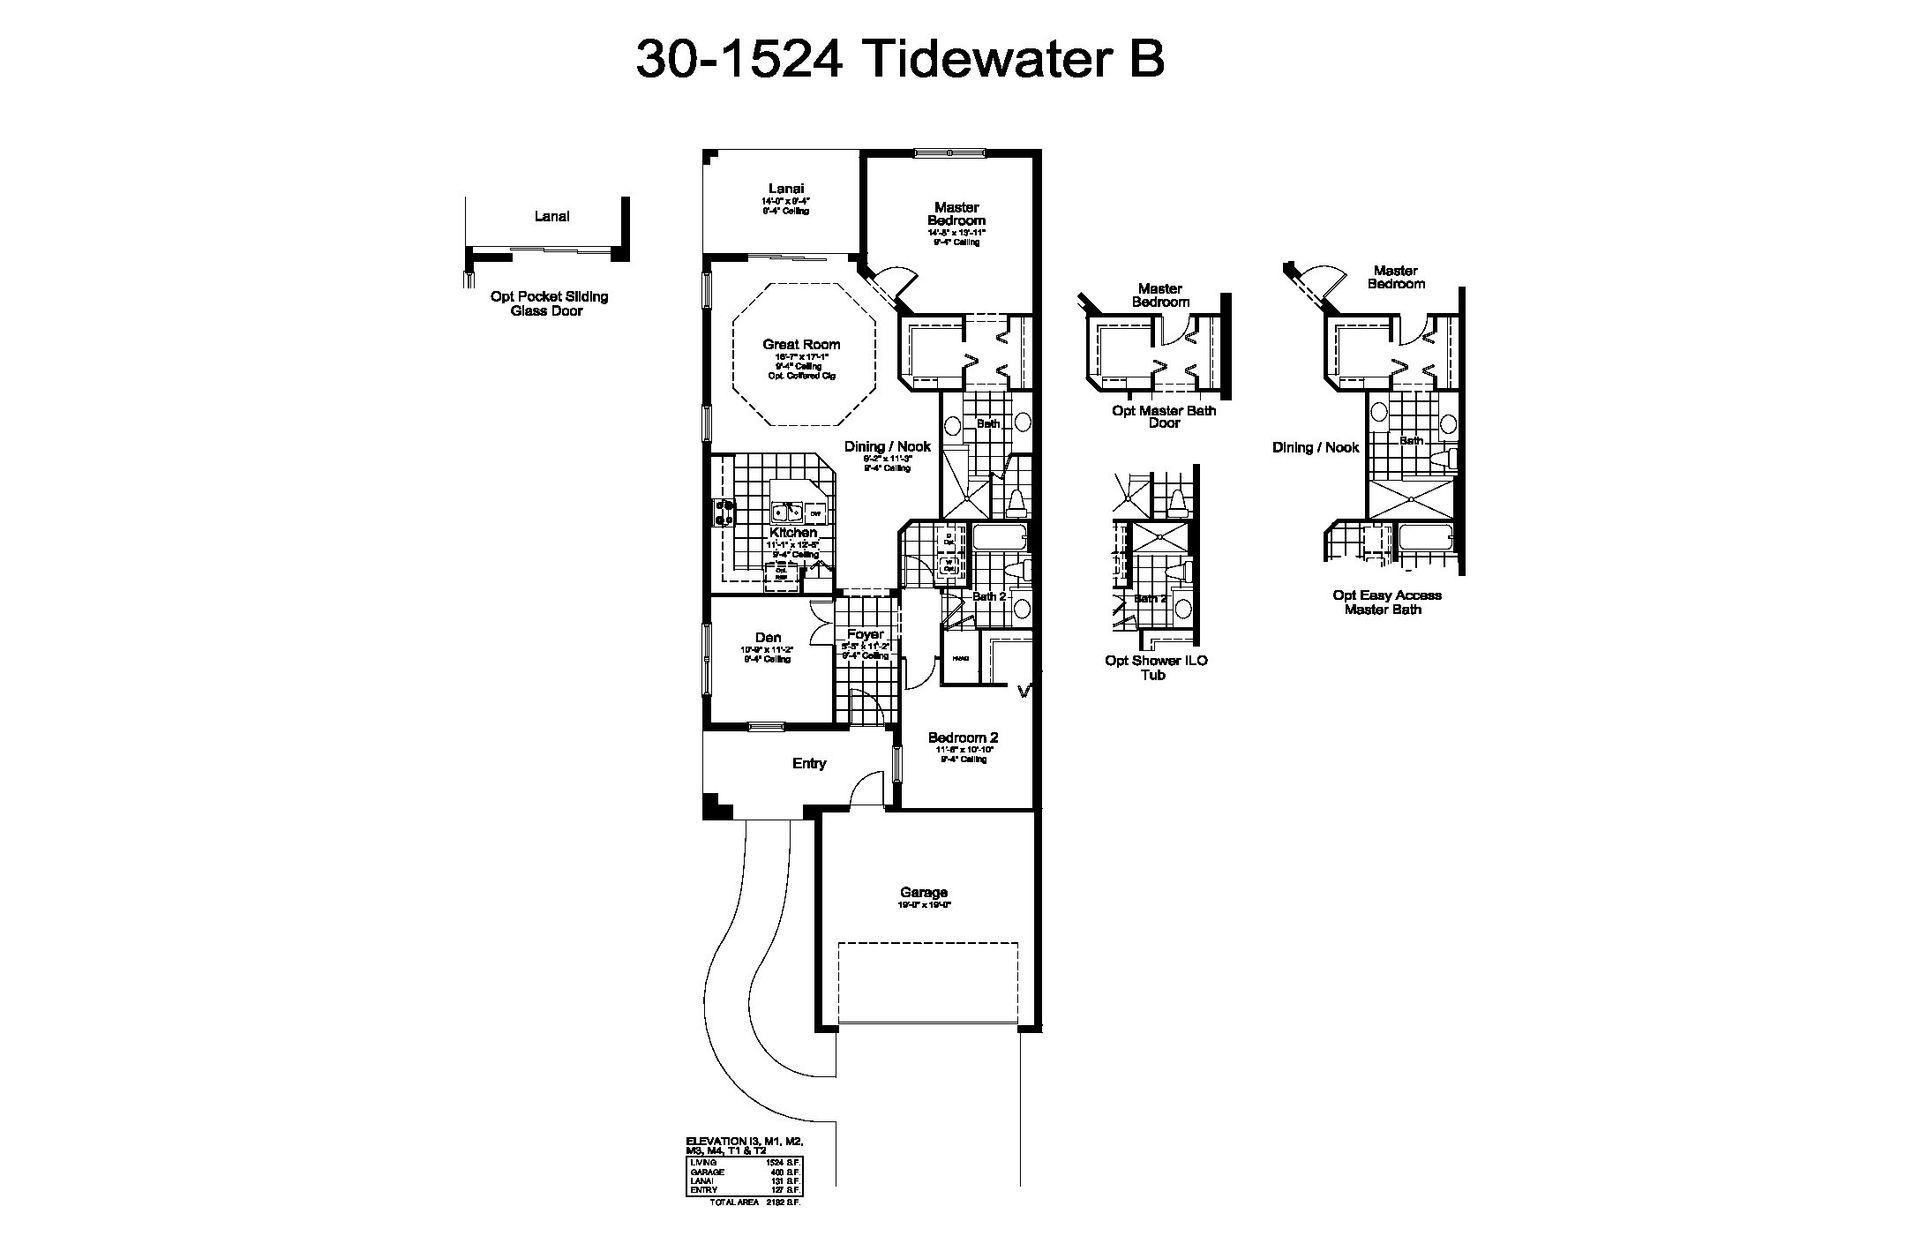 Tidewater B Plan